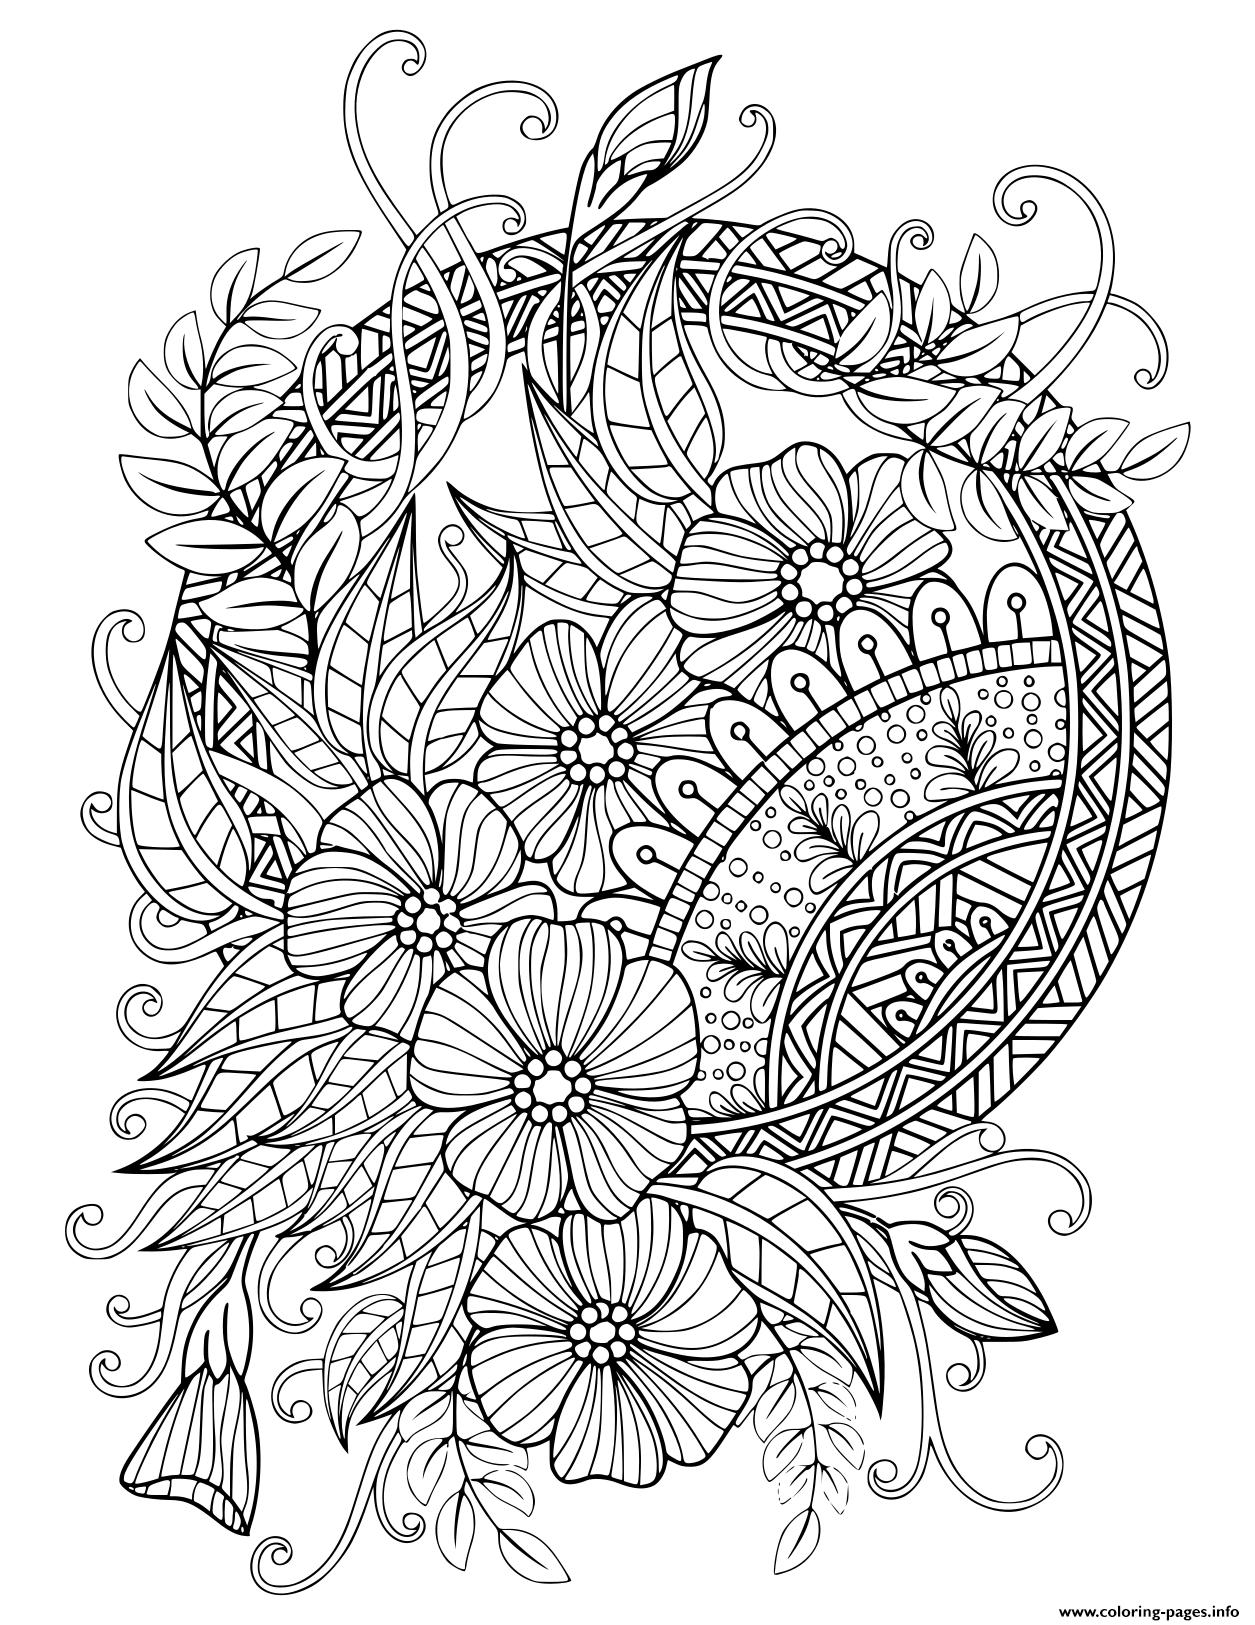 Mandala Adult Floral Nature 2020 Coloring Pages Printable